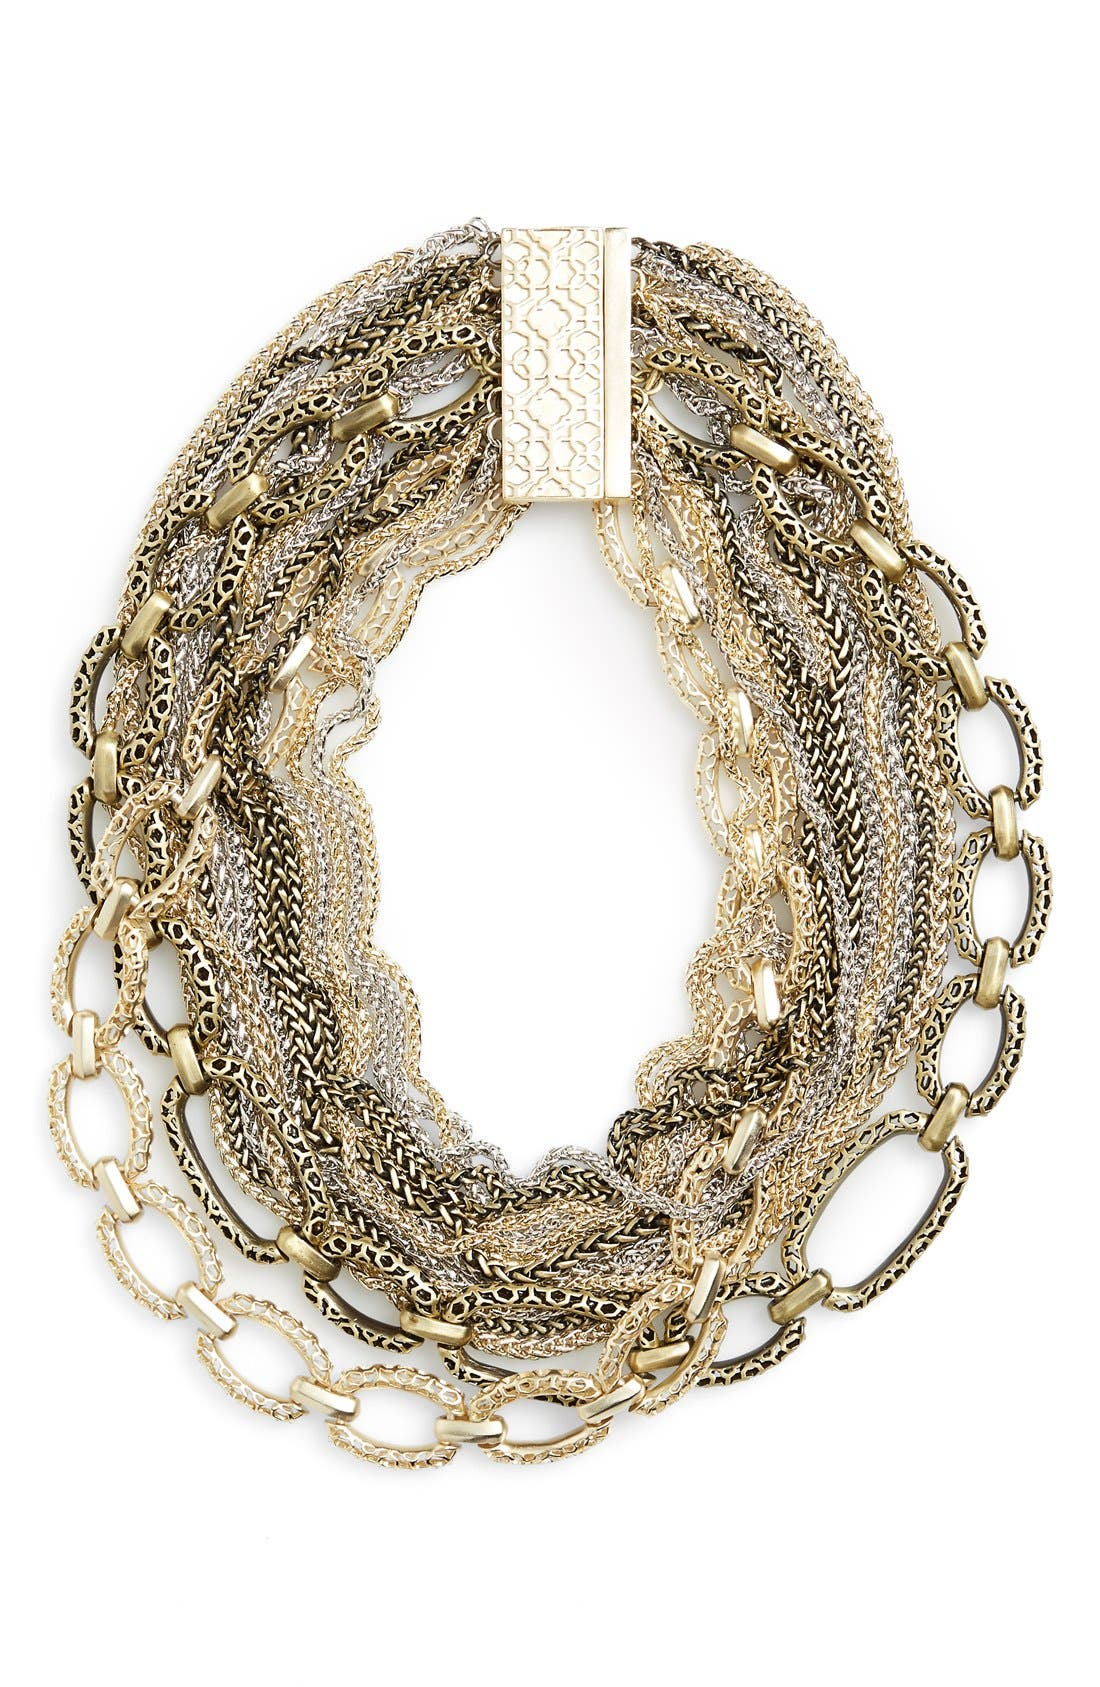 Main Image - Kendra Scott 'Marci' Mulistrand Collar Necklace